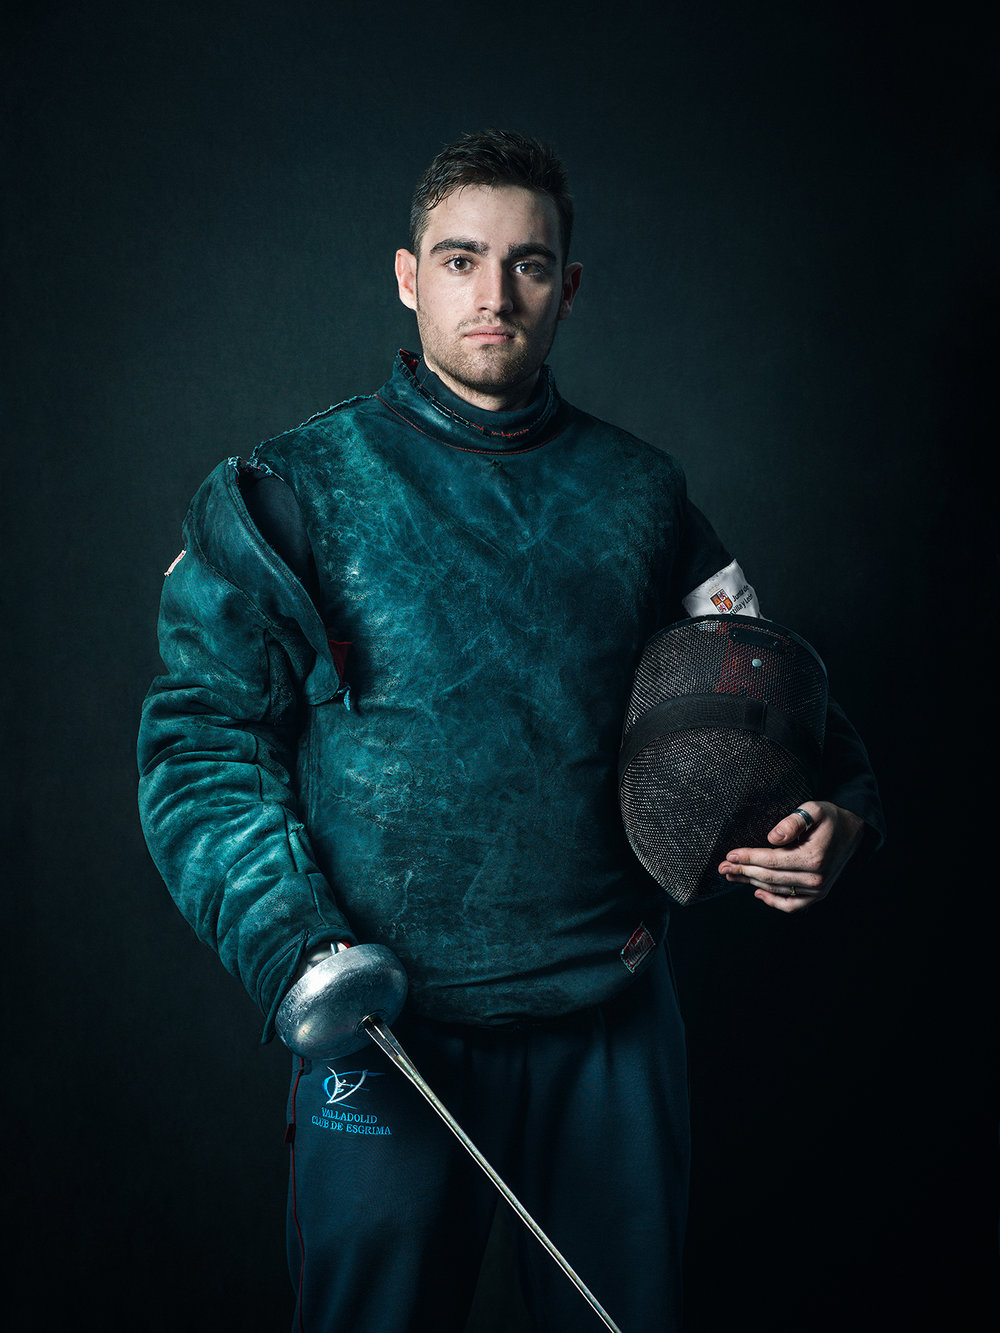 Oscar-arribas-esgrima-maestro-fencing-master-fencer-fechten-scherma-escrime-portrait-fotografo-retrato-photographer016.jpg